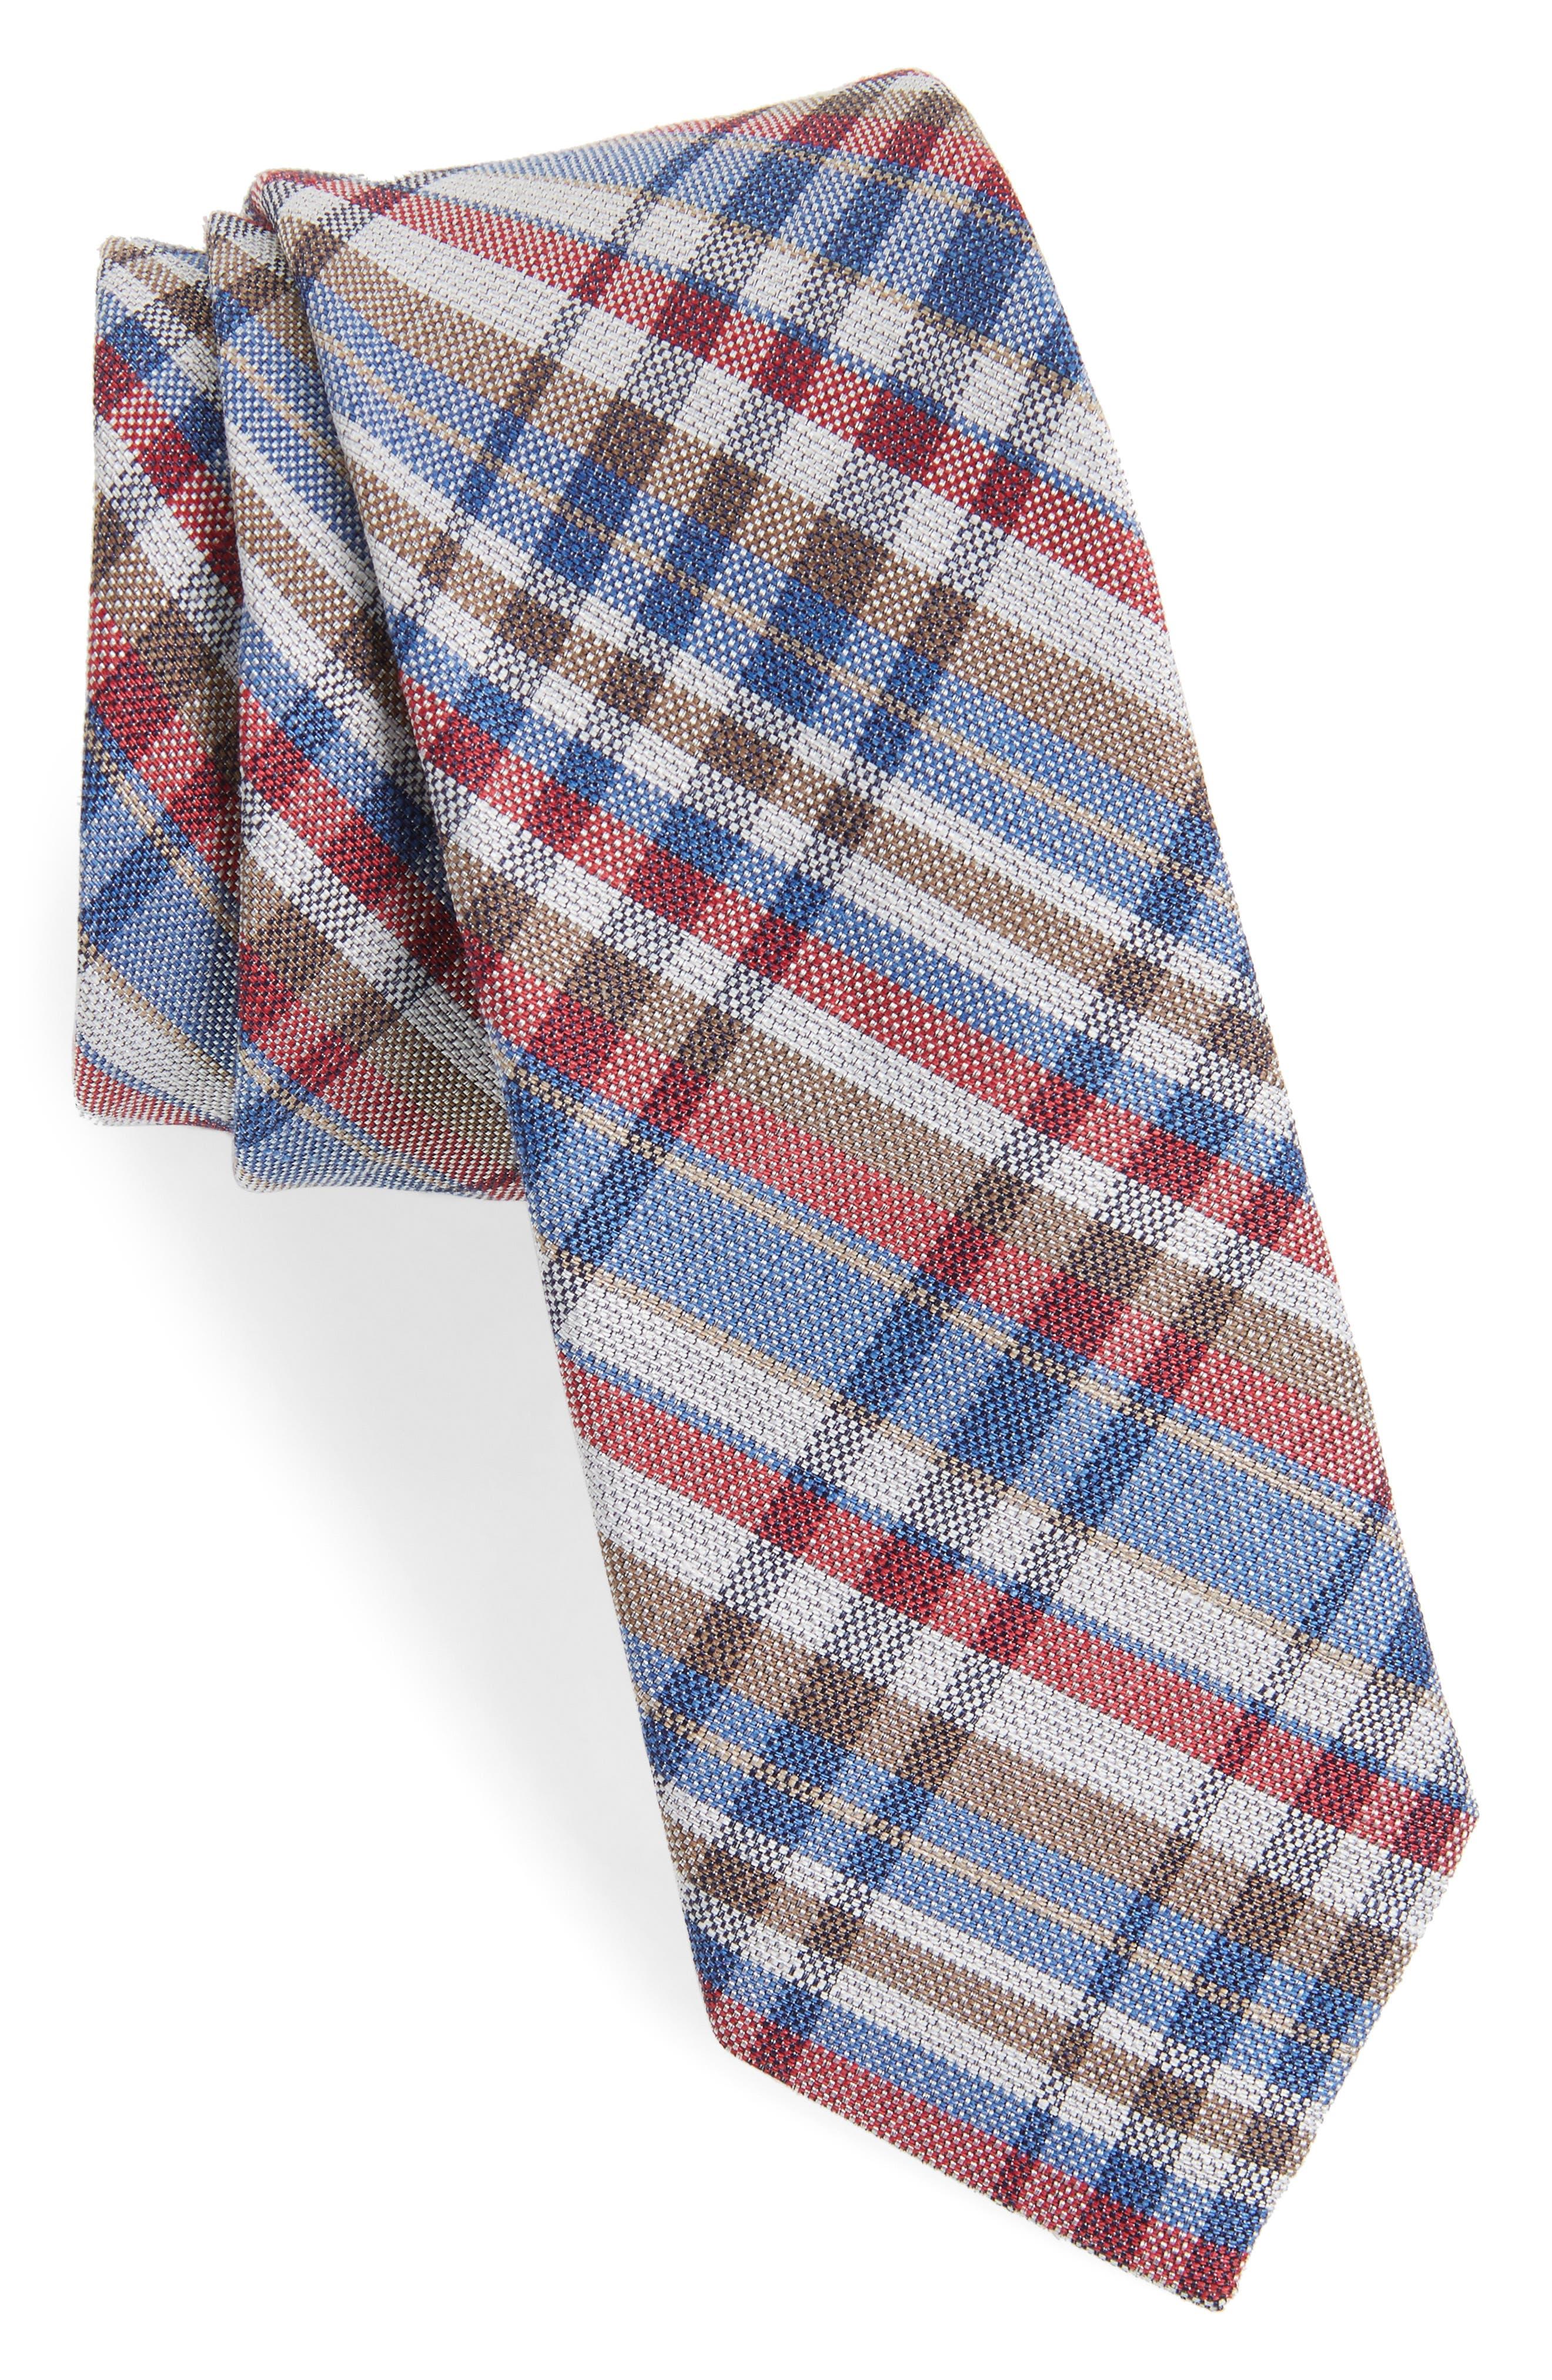 Donelly Plaid Linen & Silk Tie,                         Main,                         color, BLUE